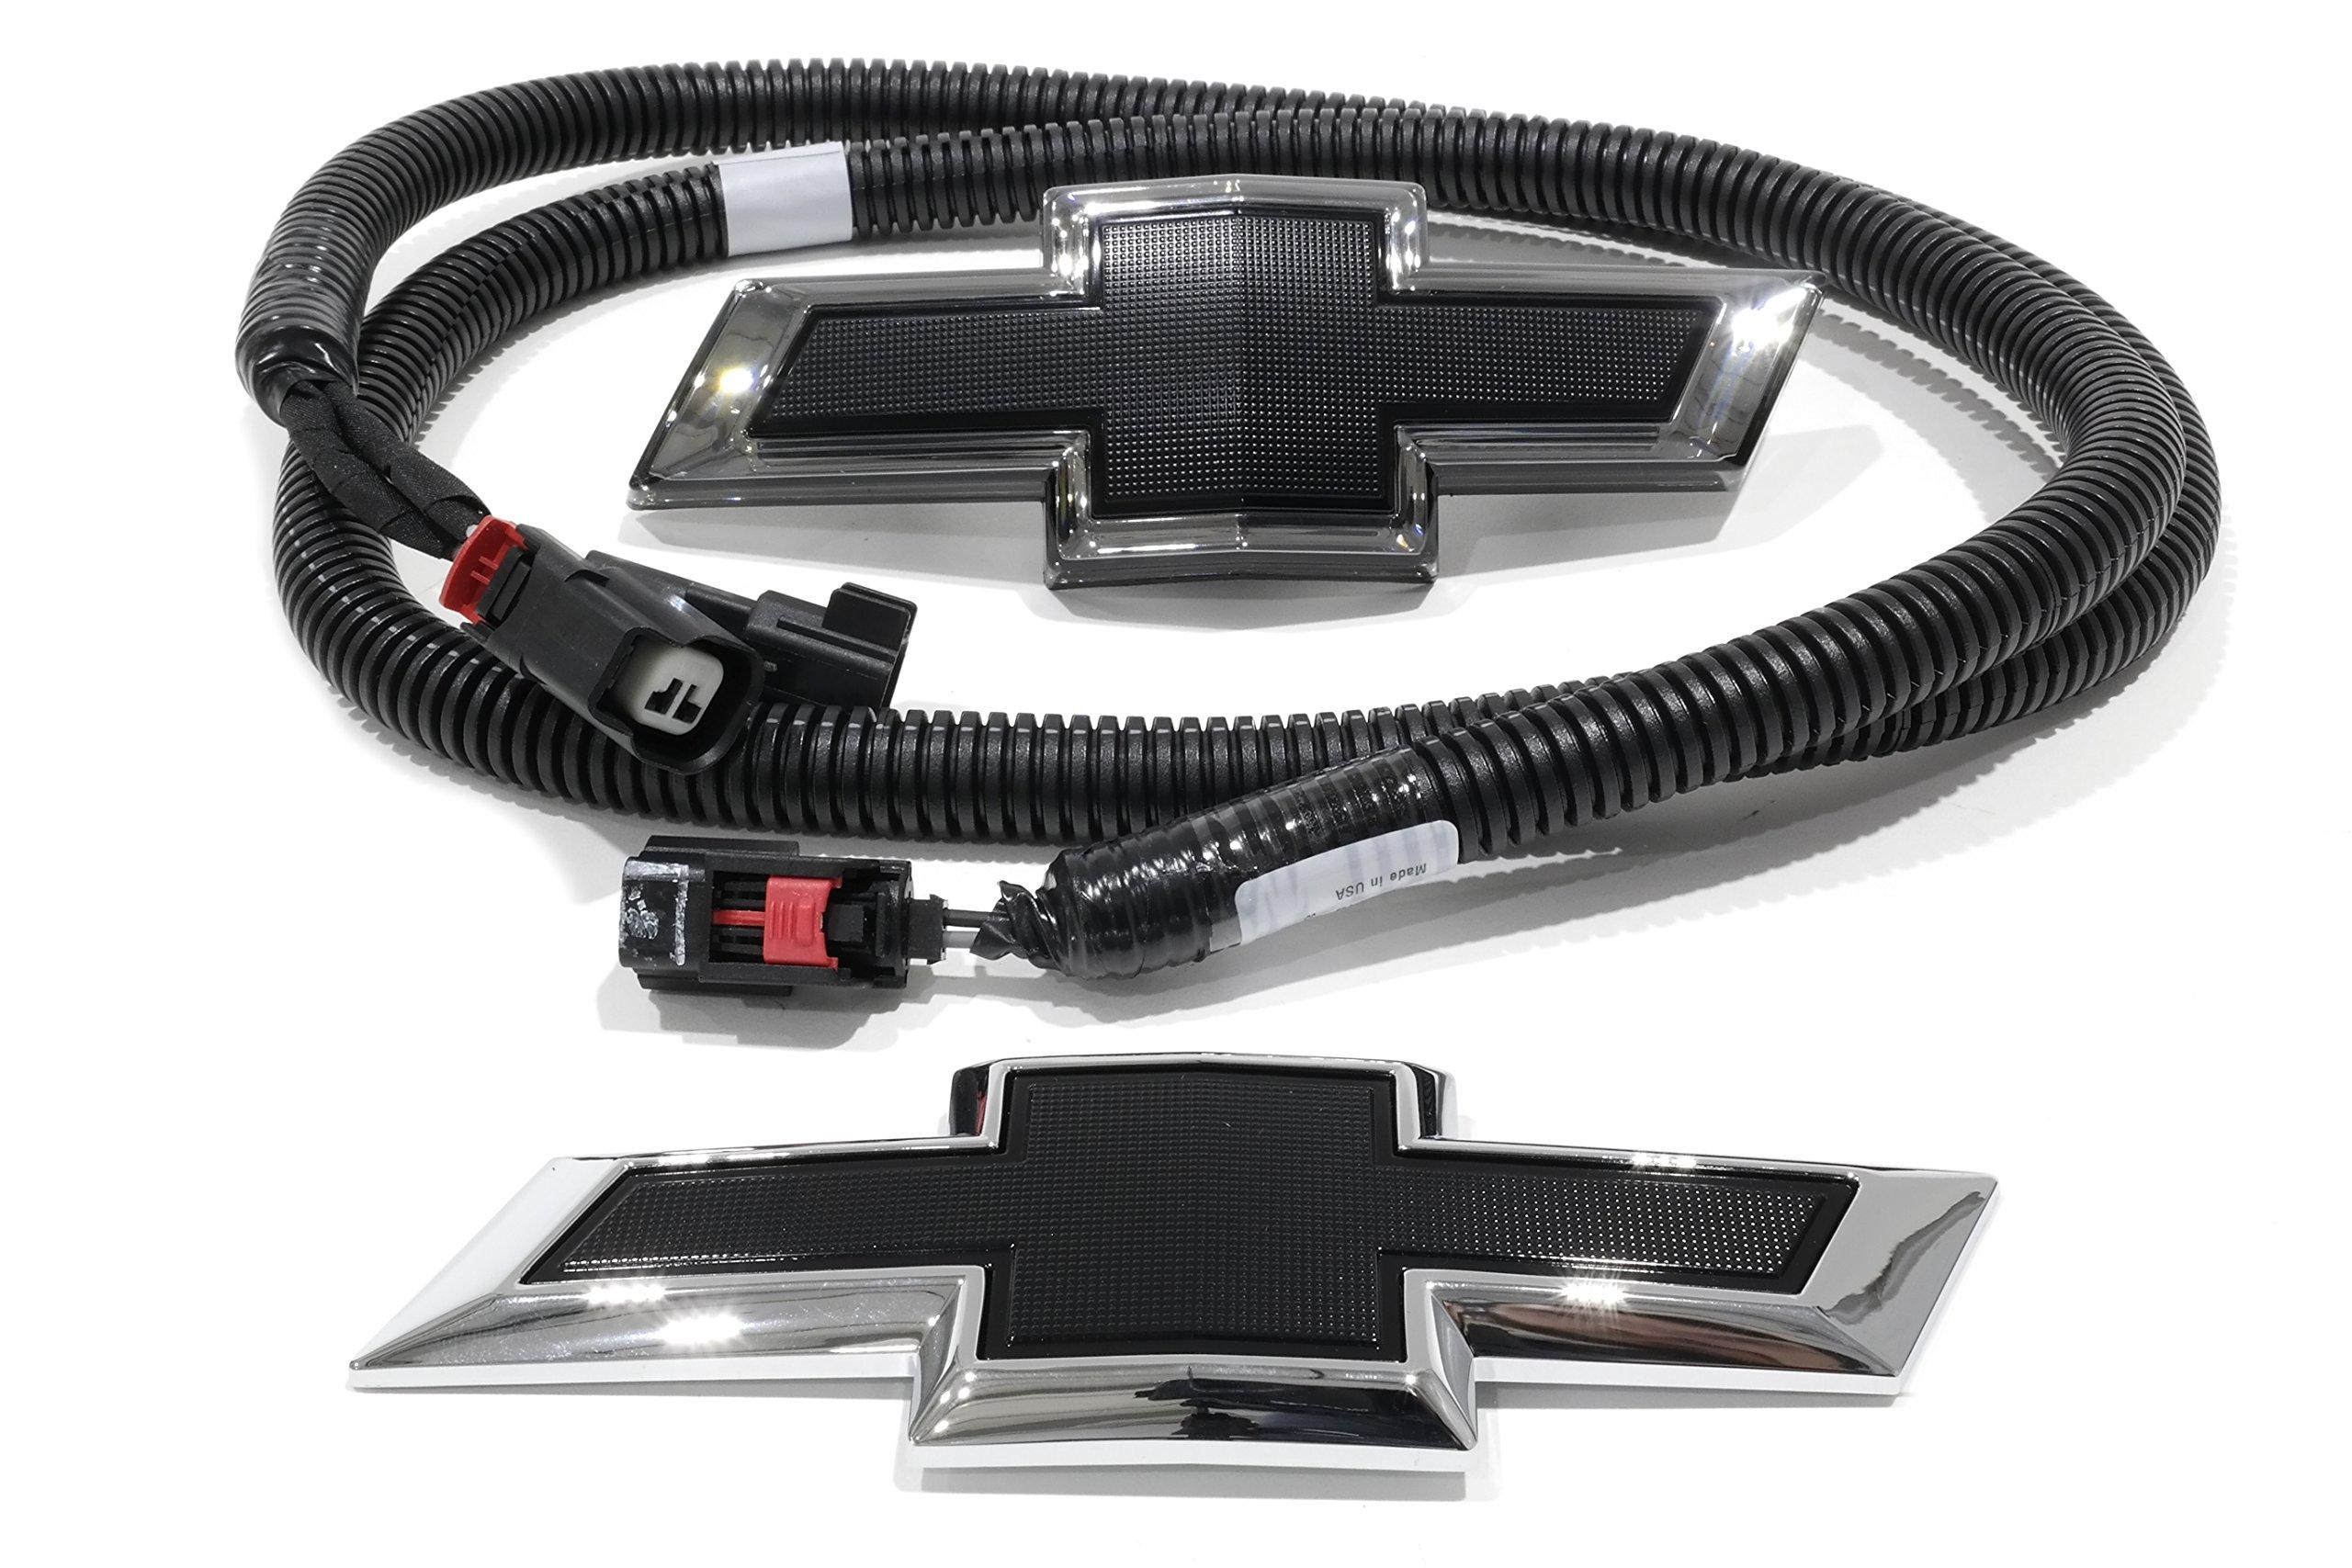 OEM NEW Illuminated Bow Tie Emblem Kit Front & Rear Black 16-17 Camaro 23393028